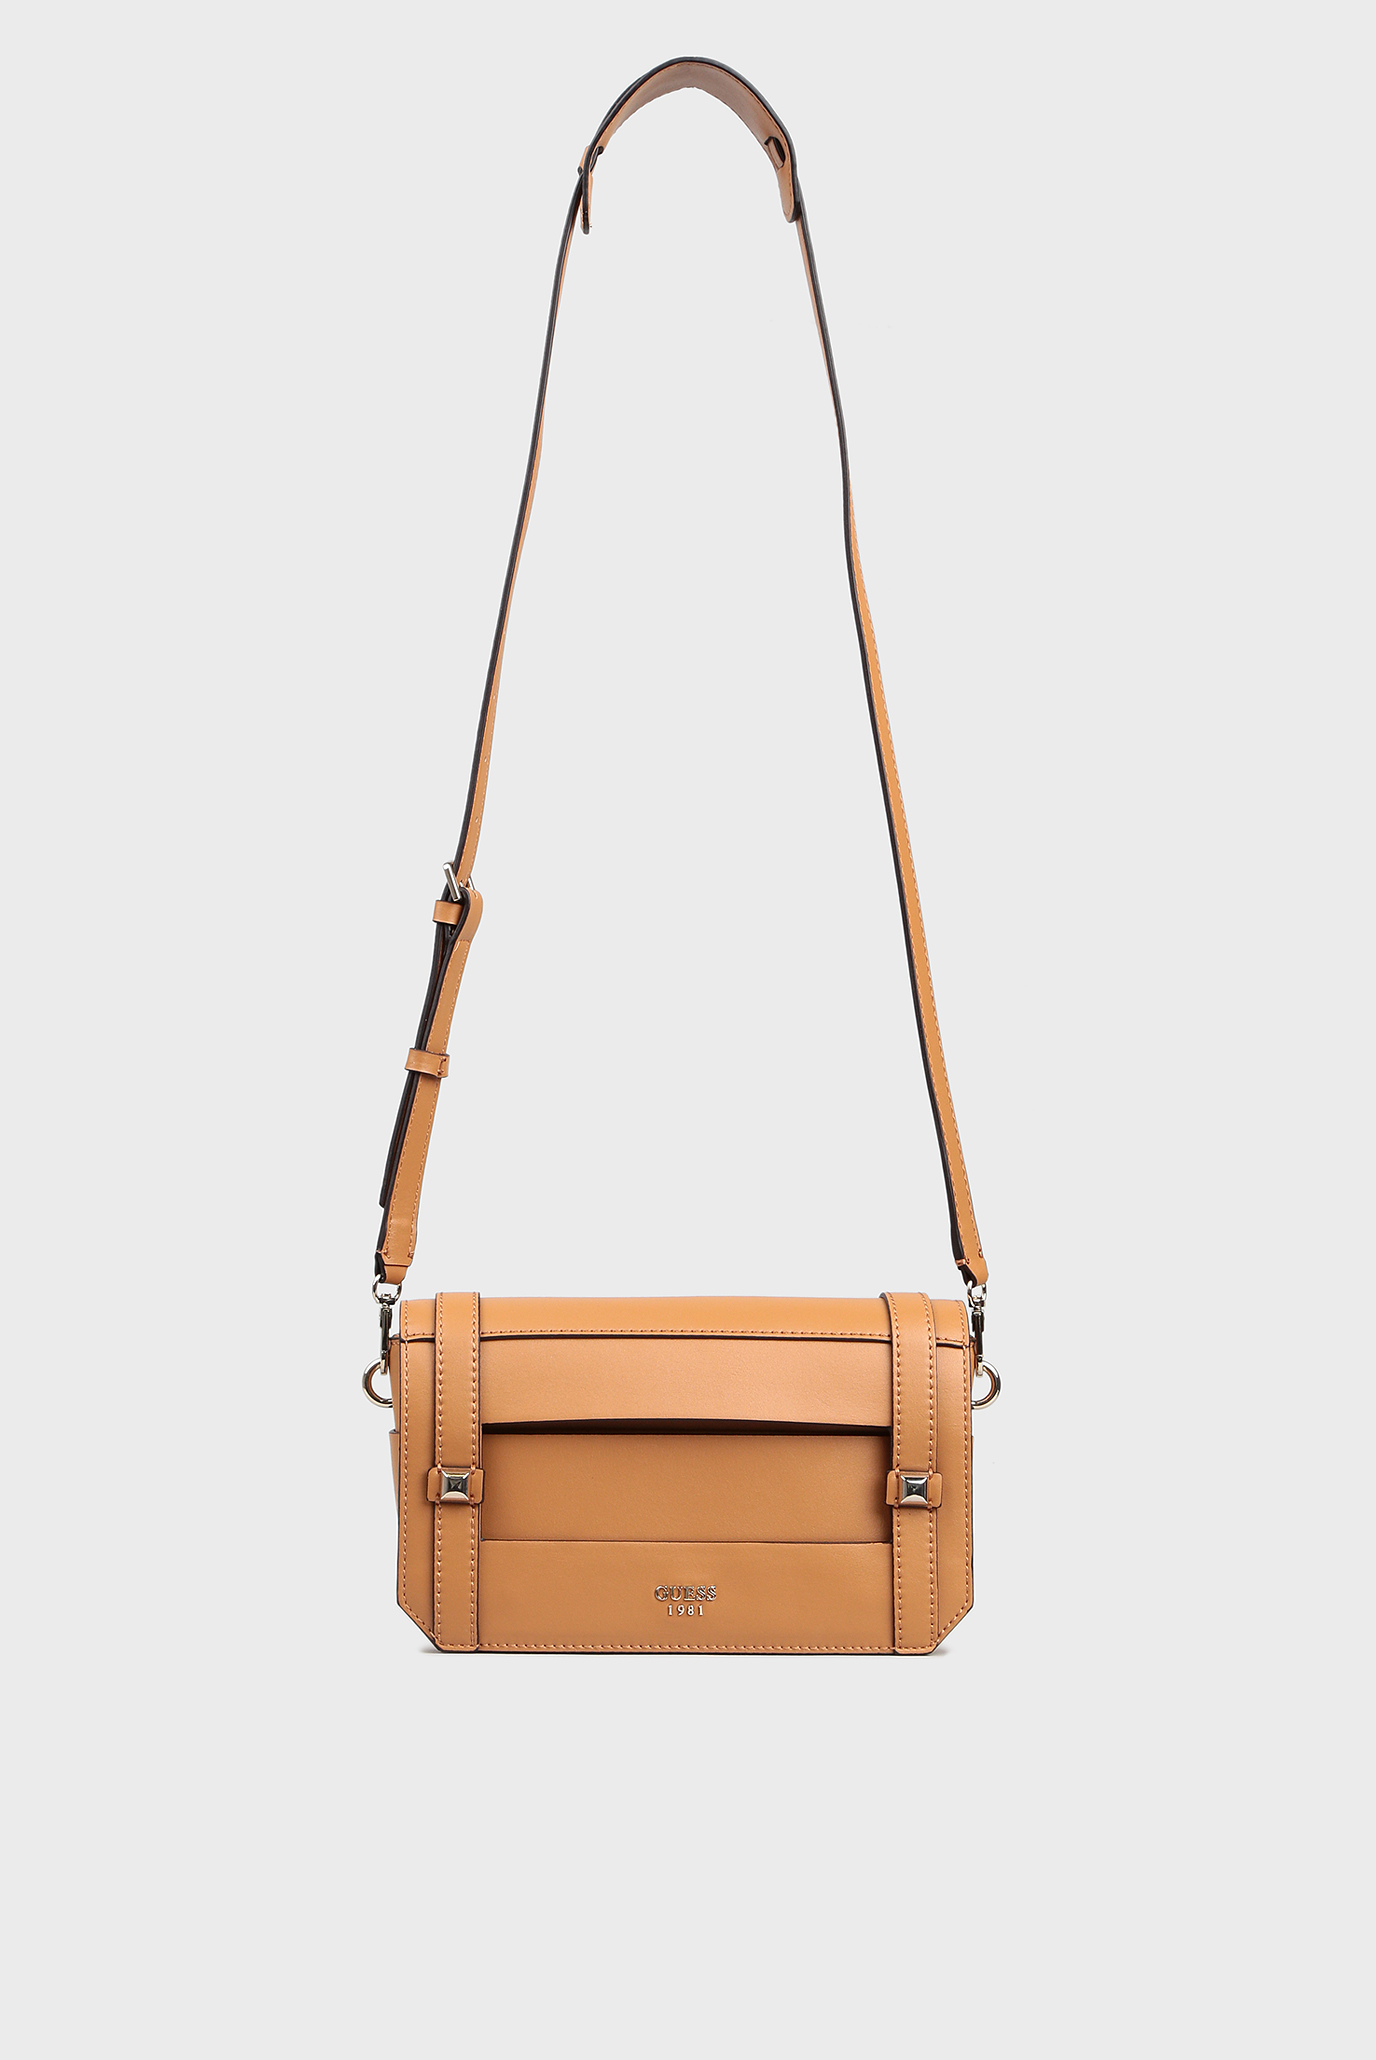 cb4d8b7461e2 Купить Женская рыжая сумка через плечо Guess Guess HWTG6860210 – Киев,  Украина. Цены в интернет магазине MD Fashion